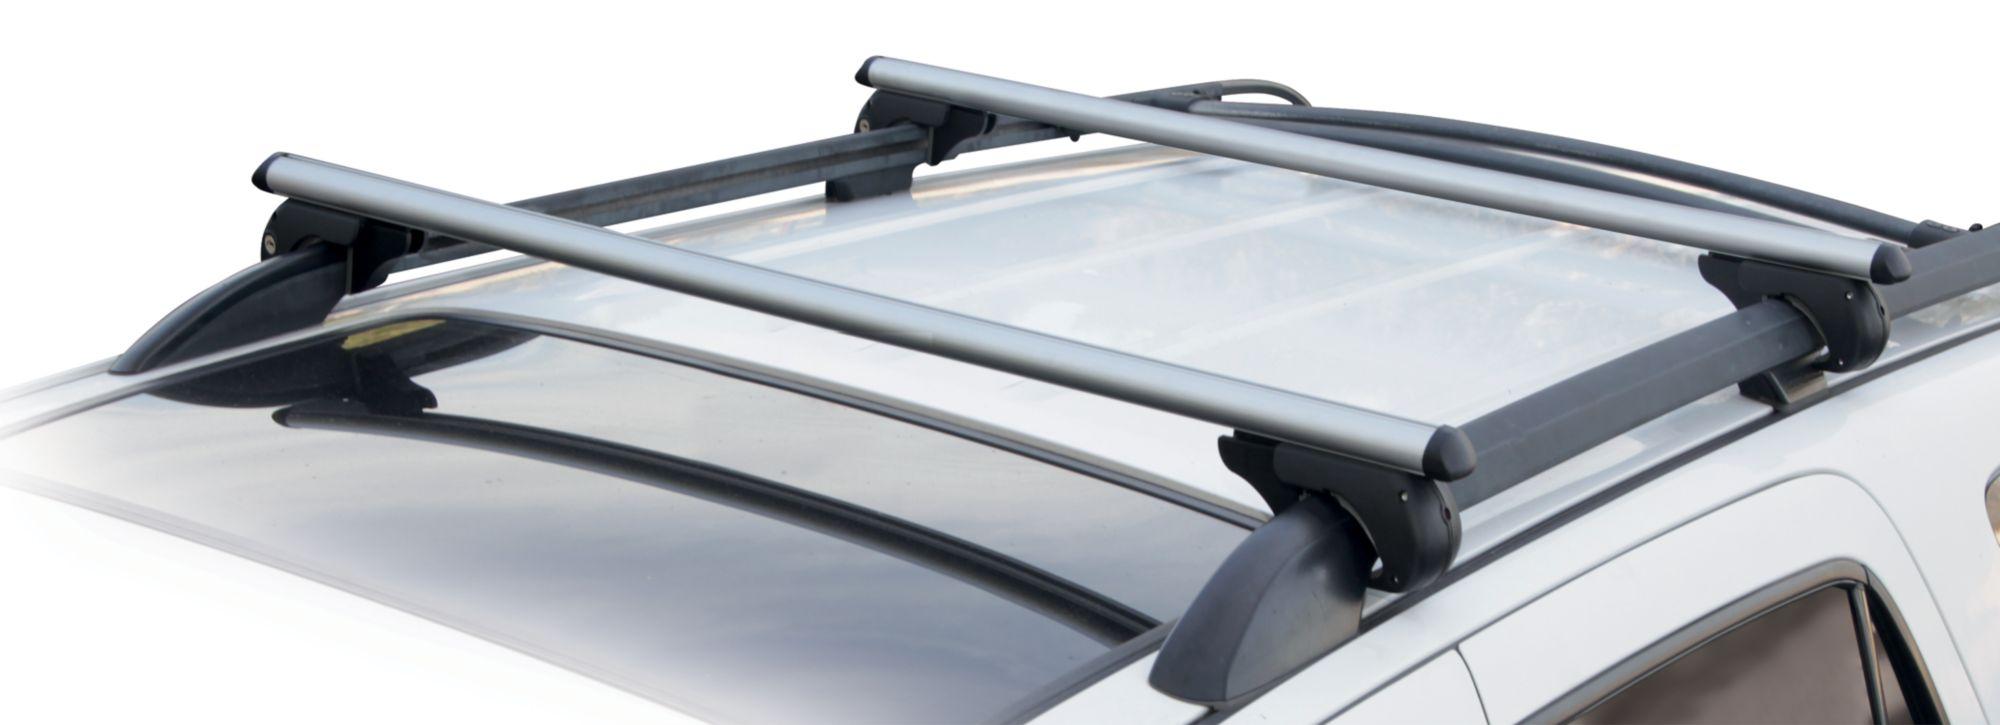 duty wrangler rack car add backbone wishlist heavy loading jeep roof to ski modula product racks jk for